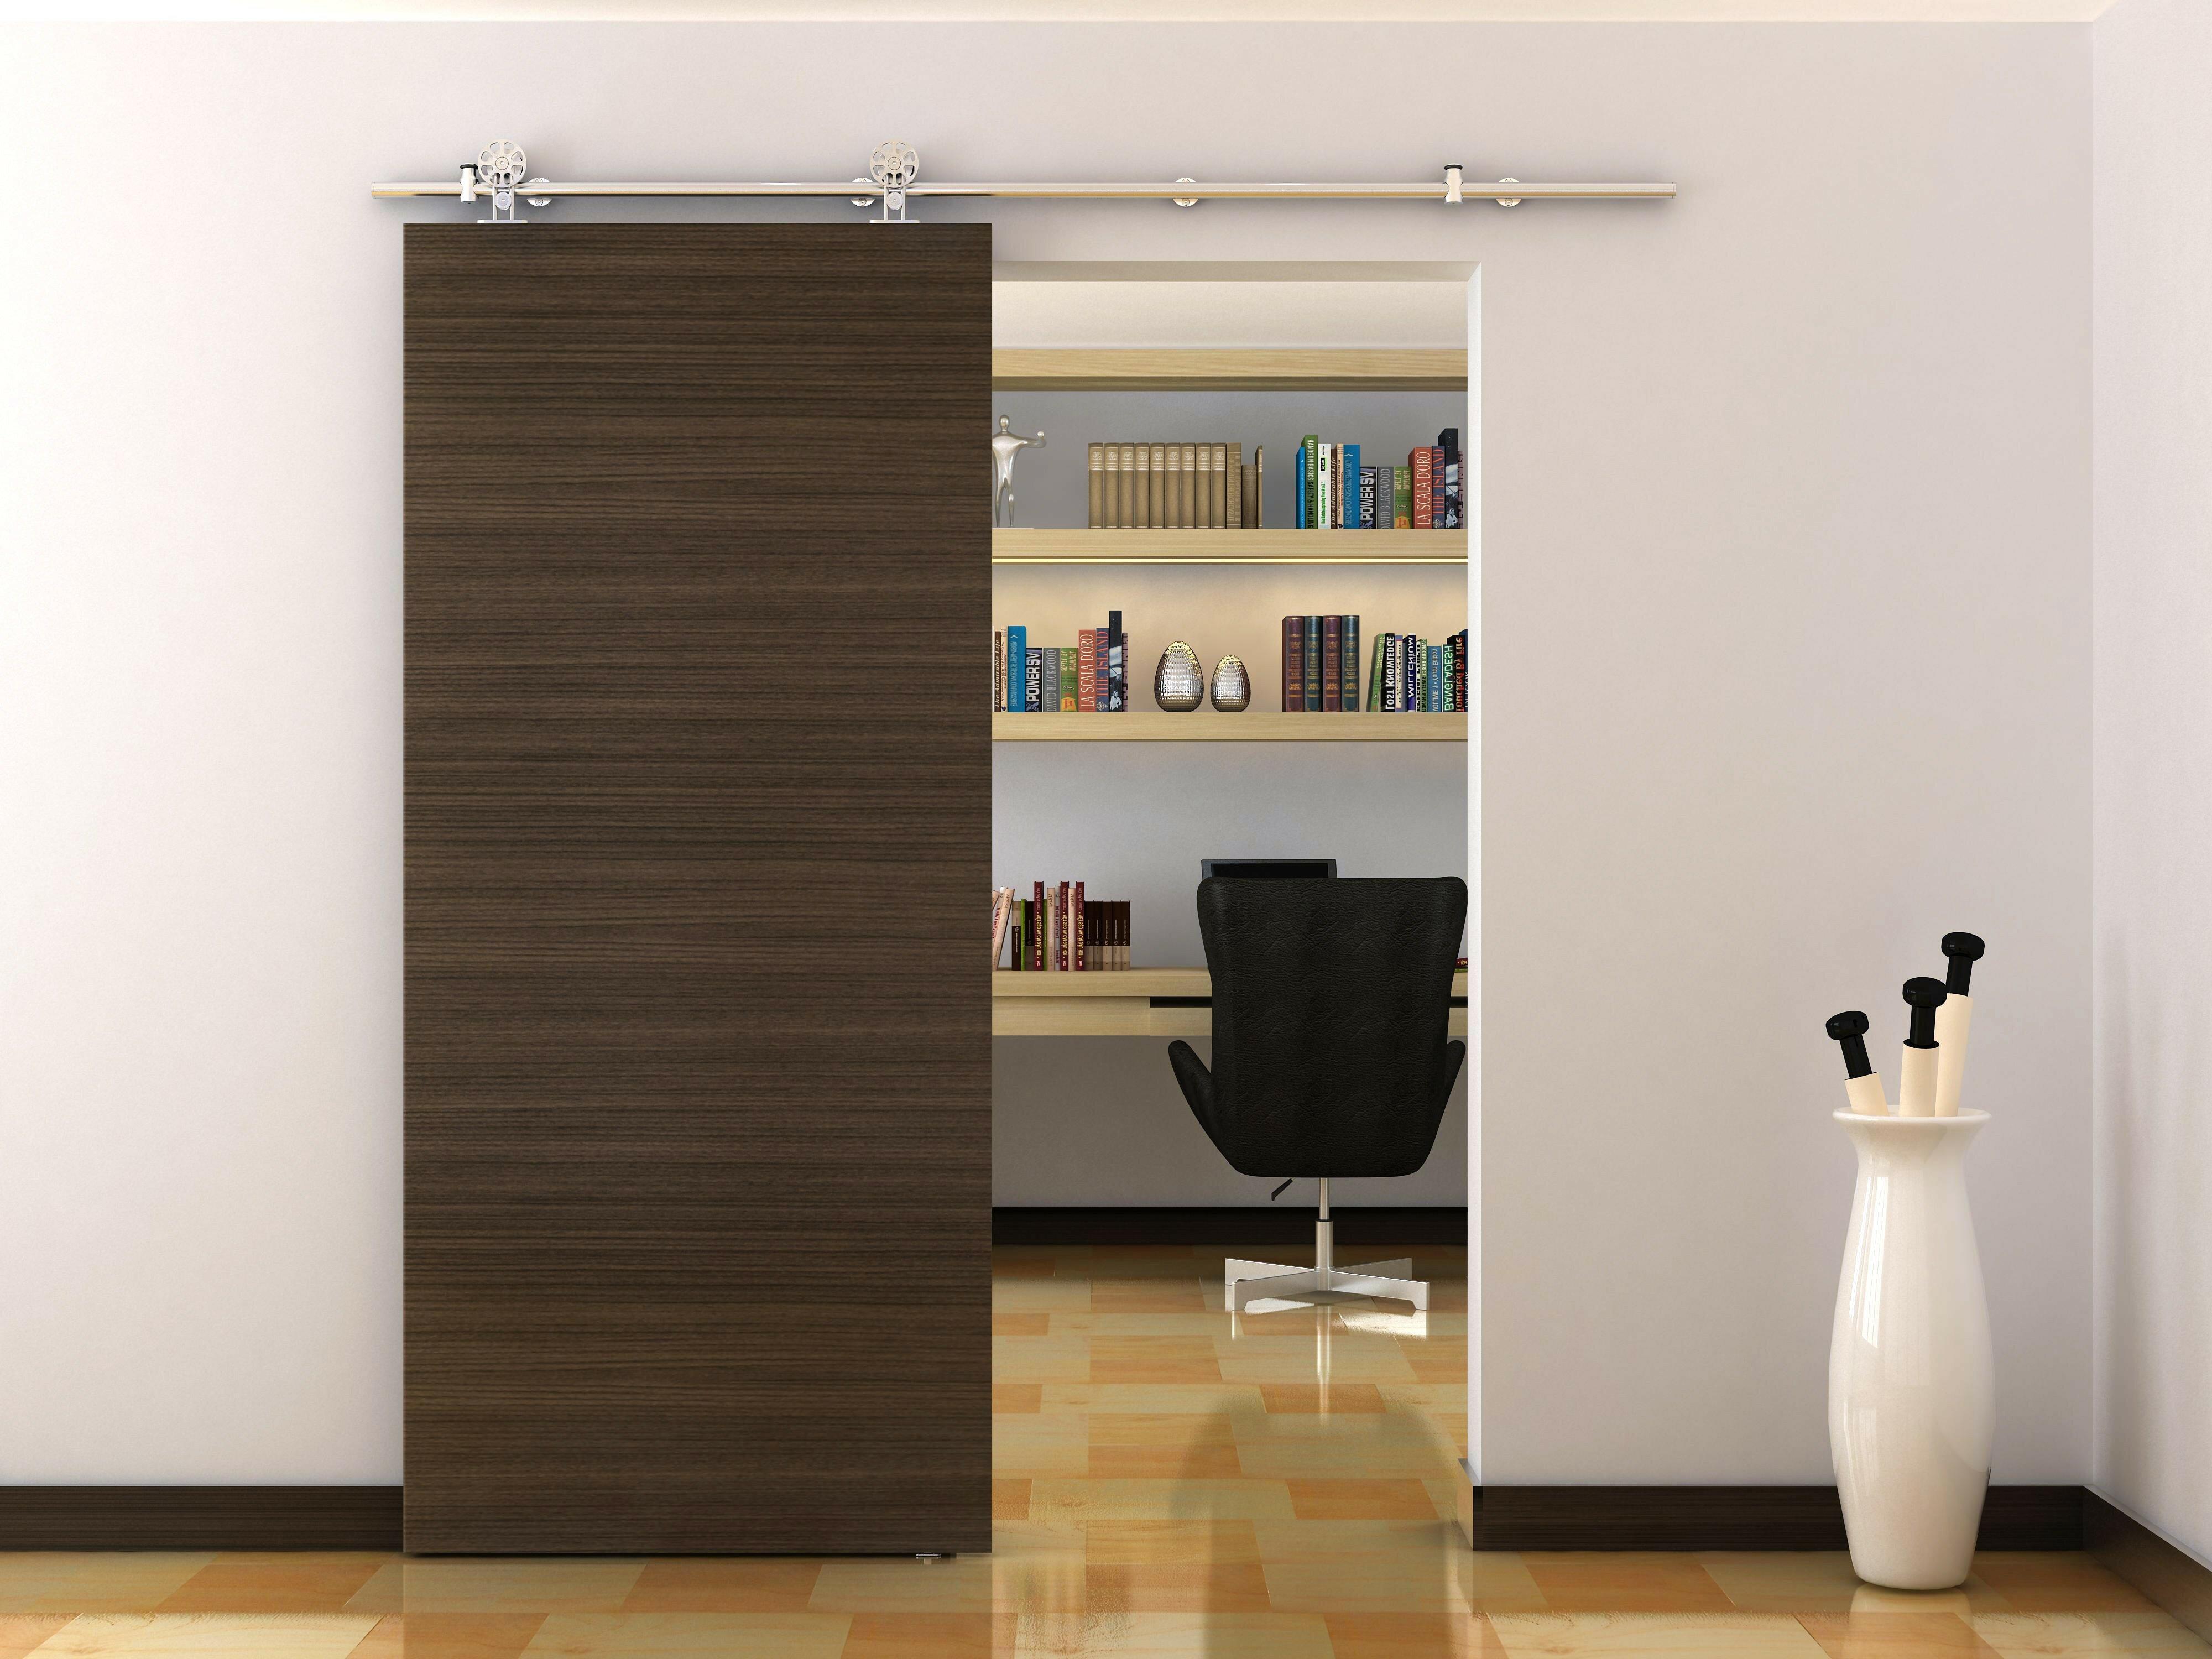 new sliding steel text wood storage stainless barns product hardware modern finish furniture barn satin door